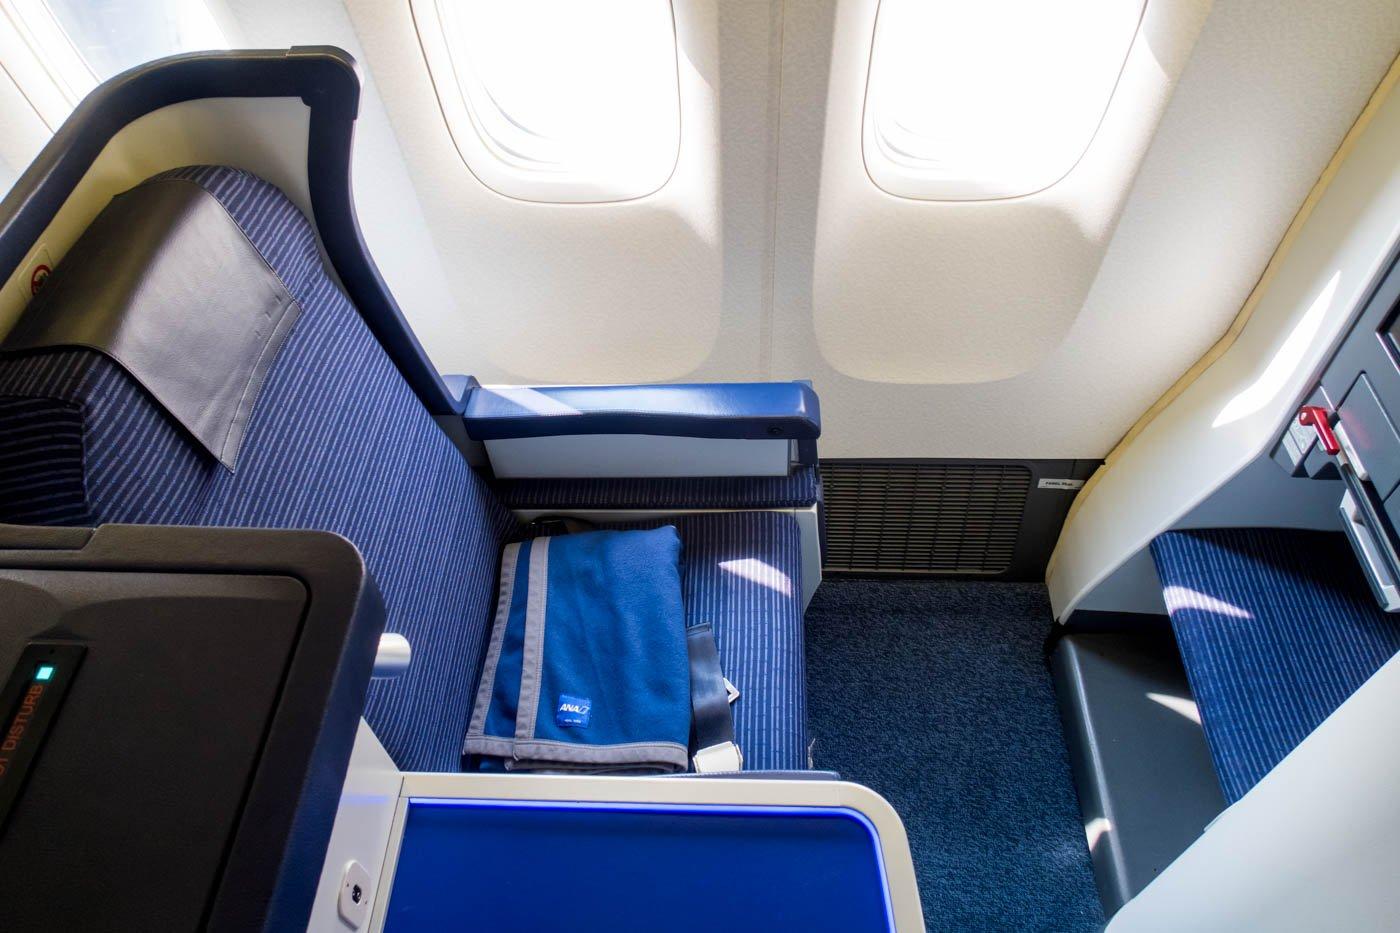 ANA 777-300ER Business Class Seat